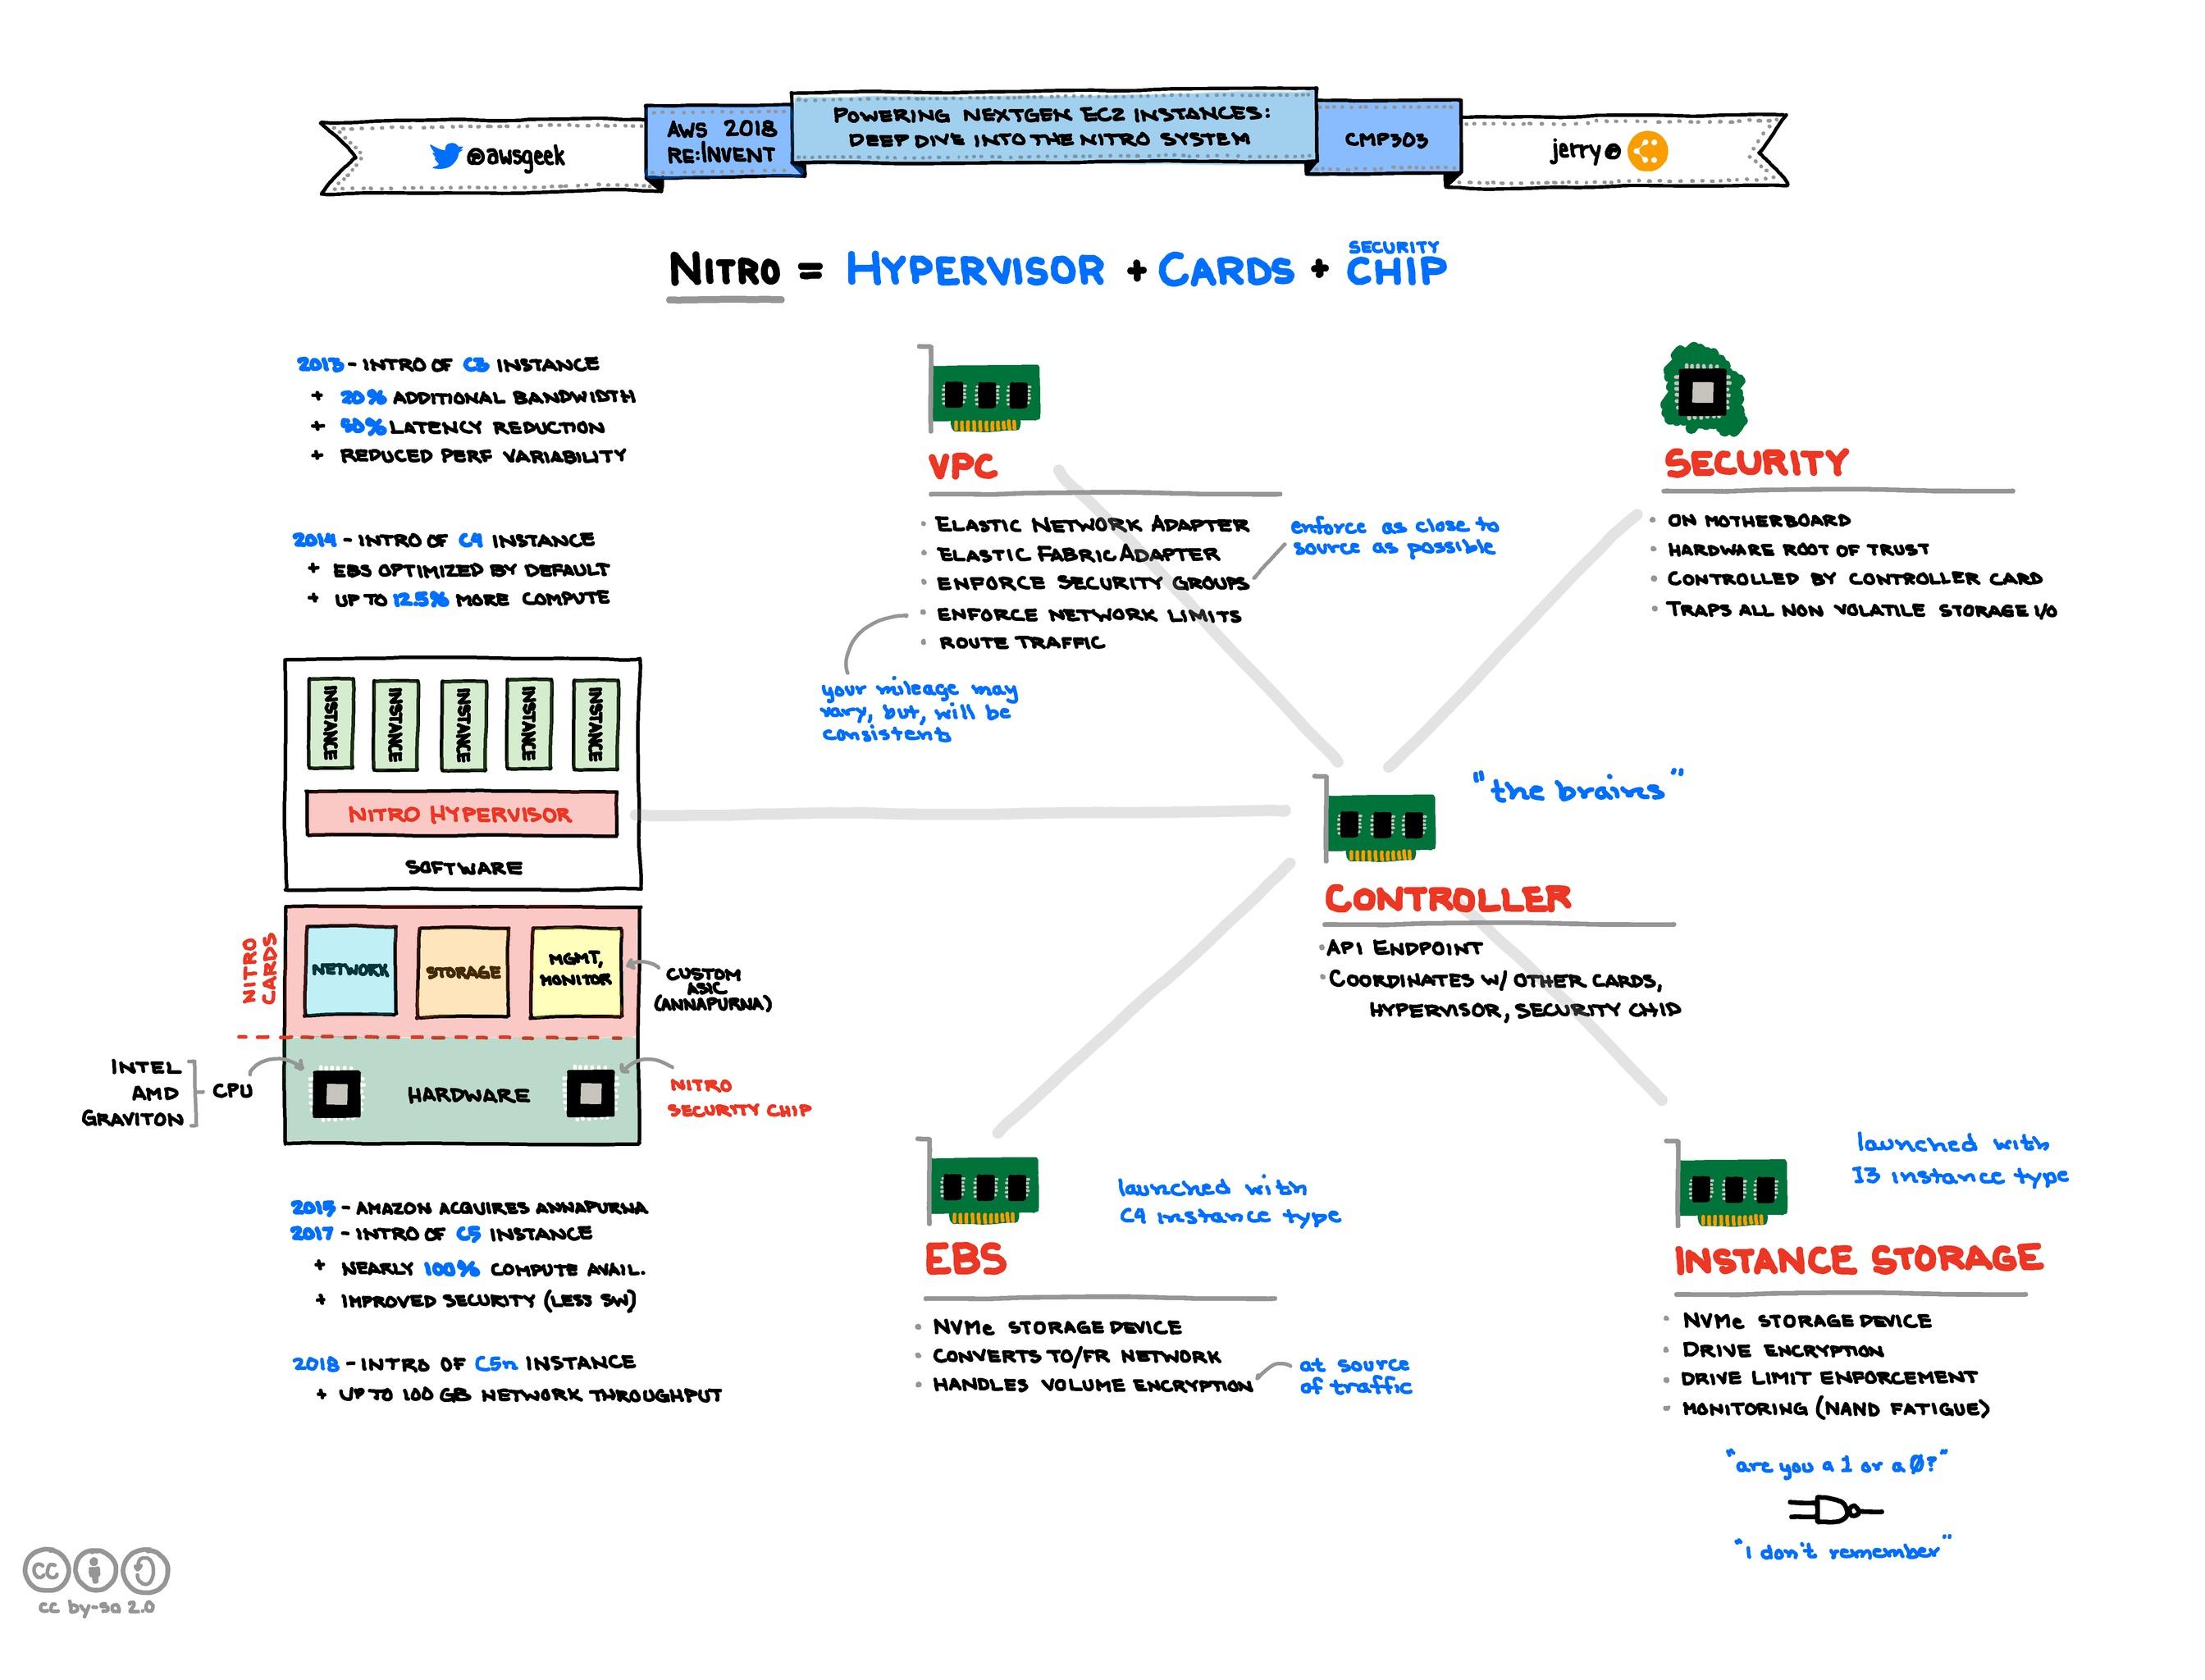 Powering-Next-Gen-EC2-Instances-Deep-Dive-into-the-Nitro-System.jpg